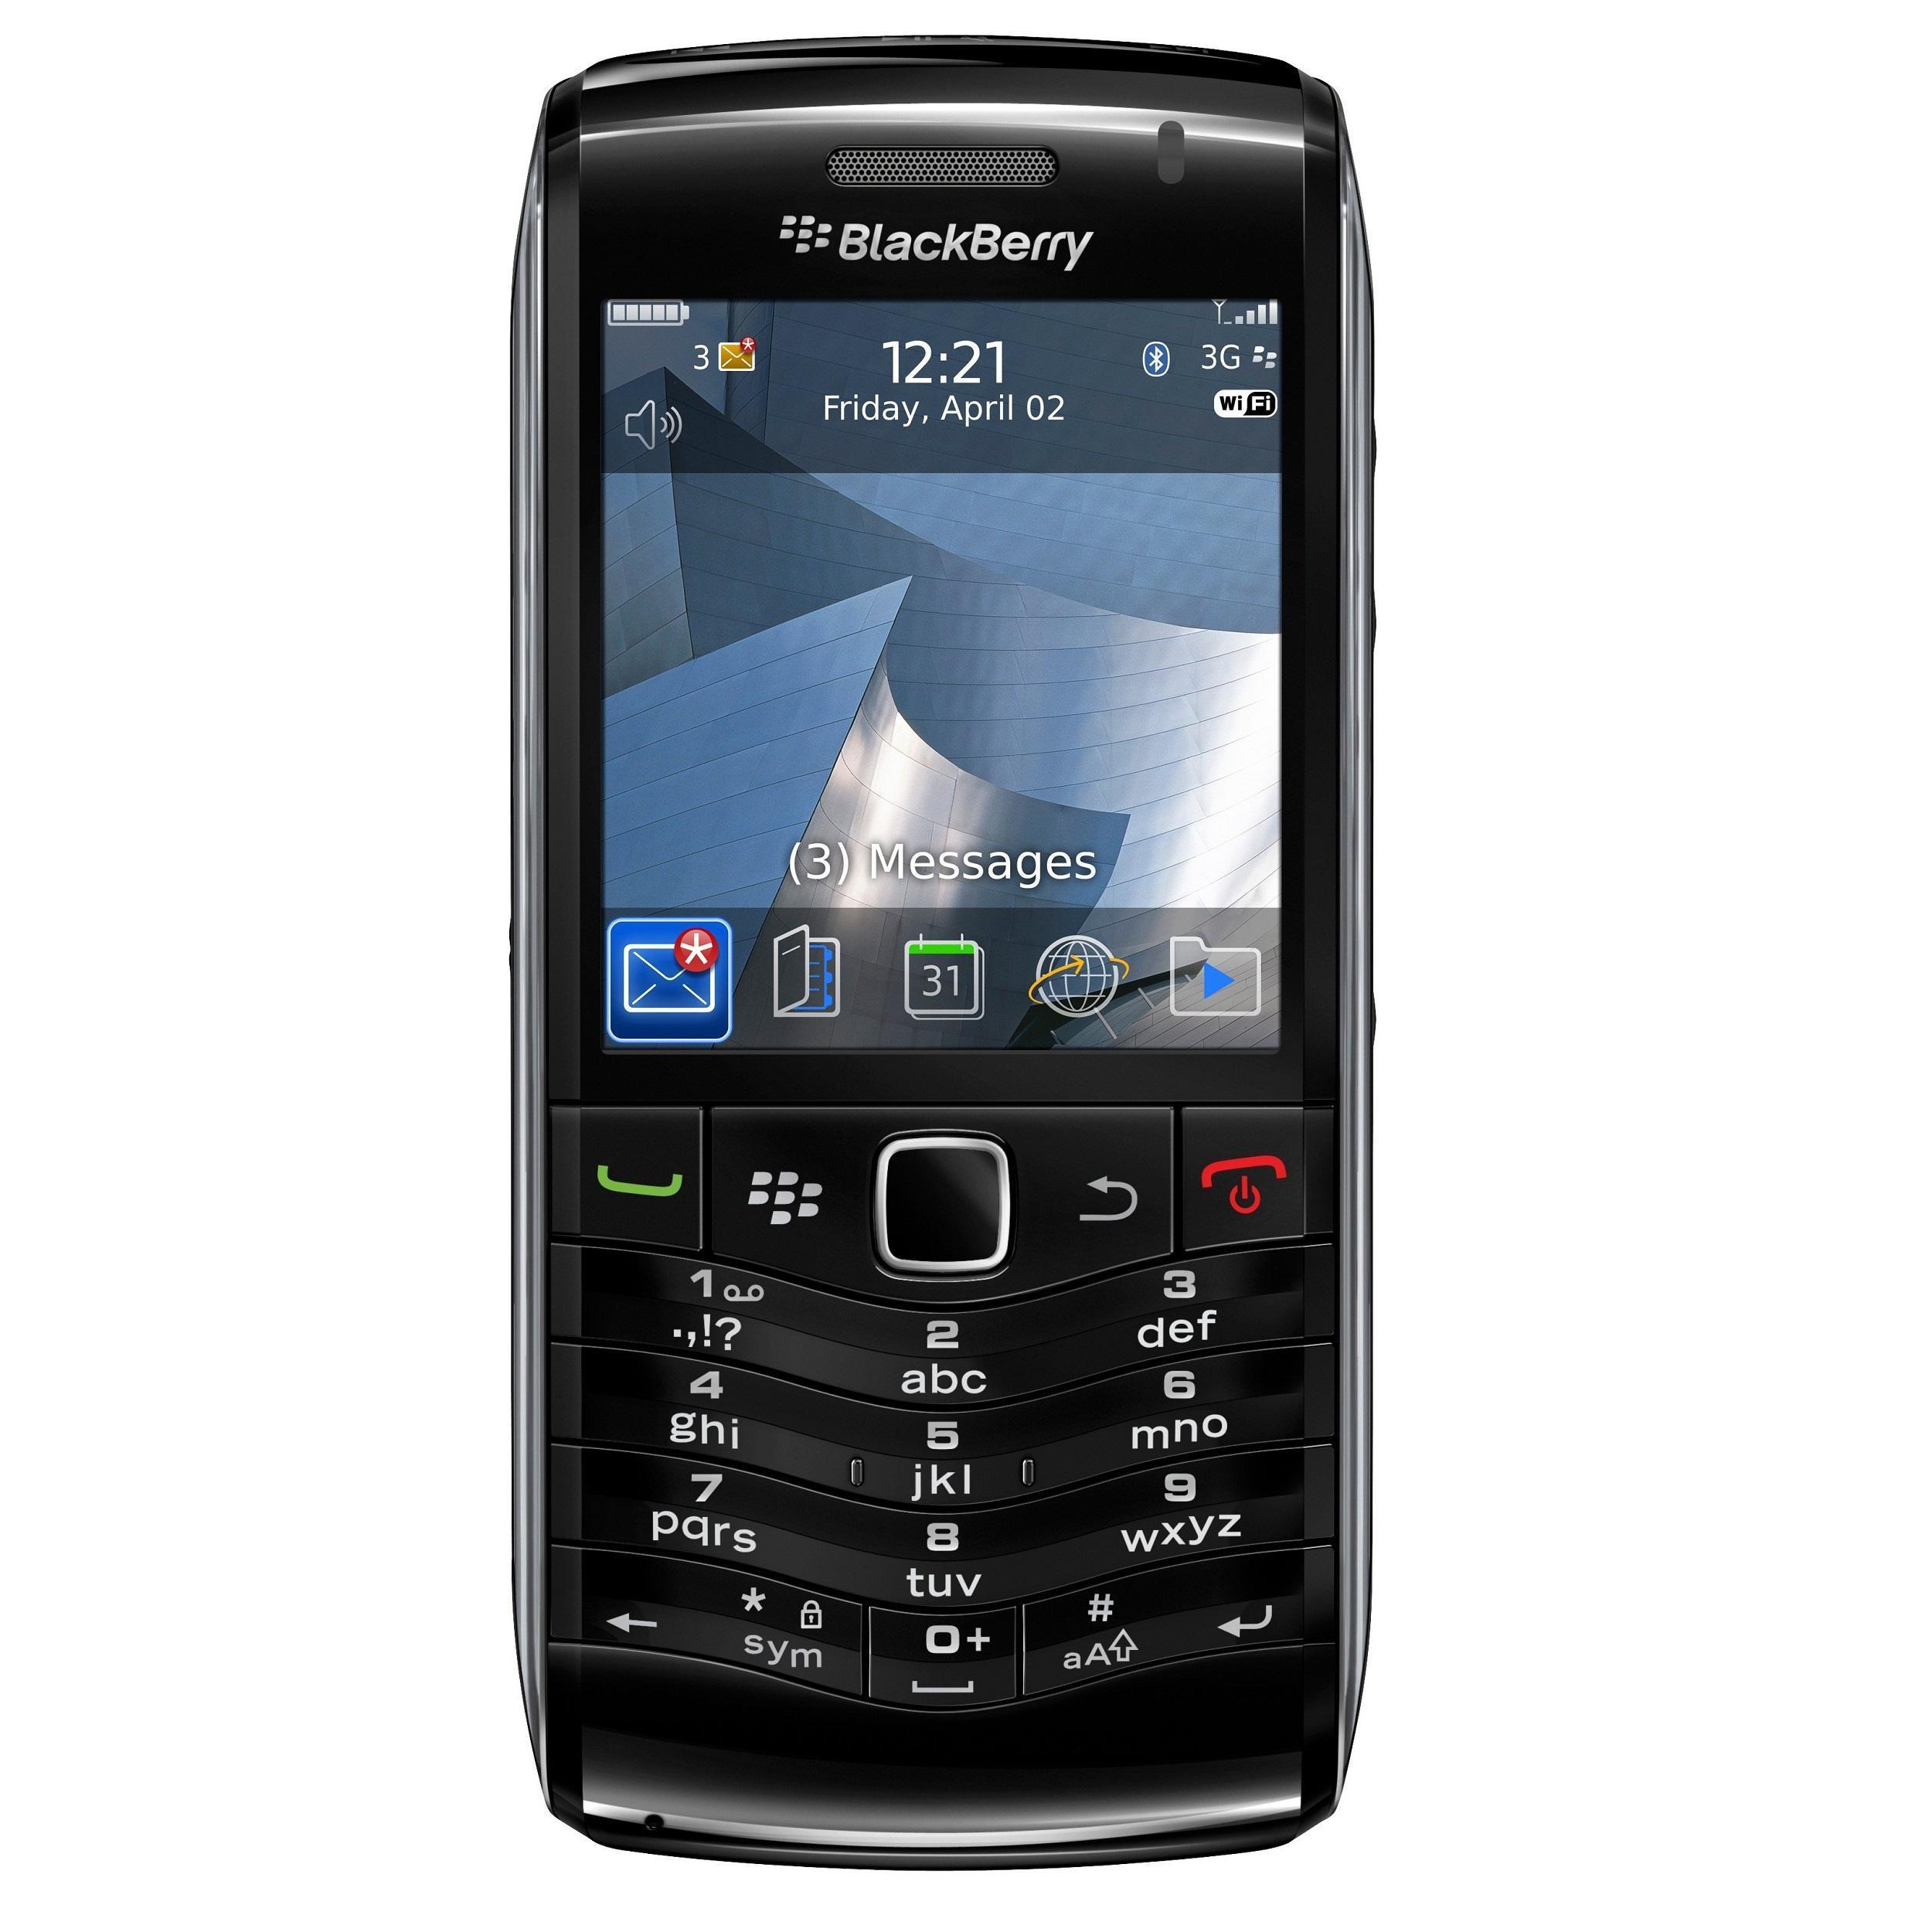 BlackBerry Pearl 3G 9105 Unlocked GSM Black Cell Phone